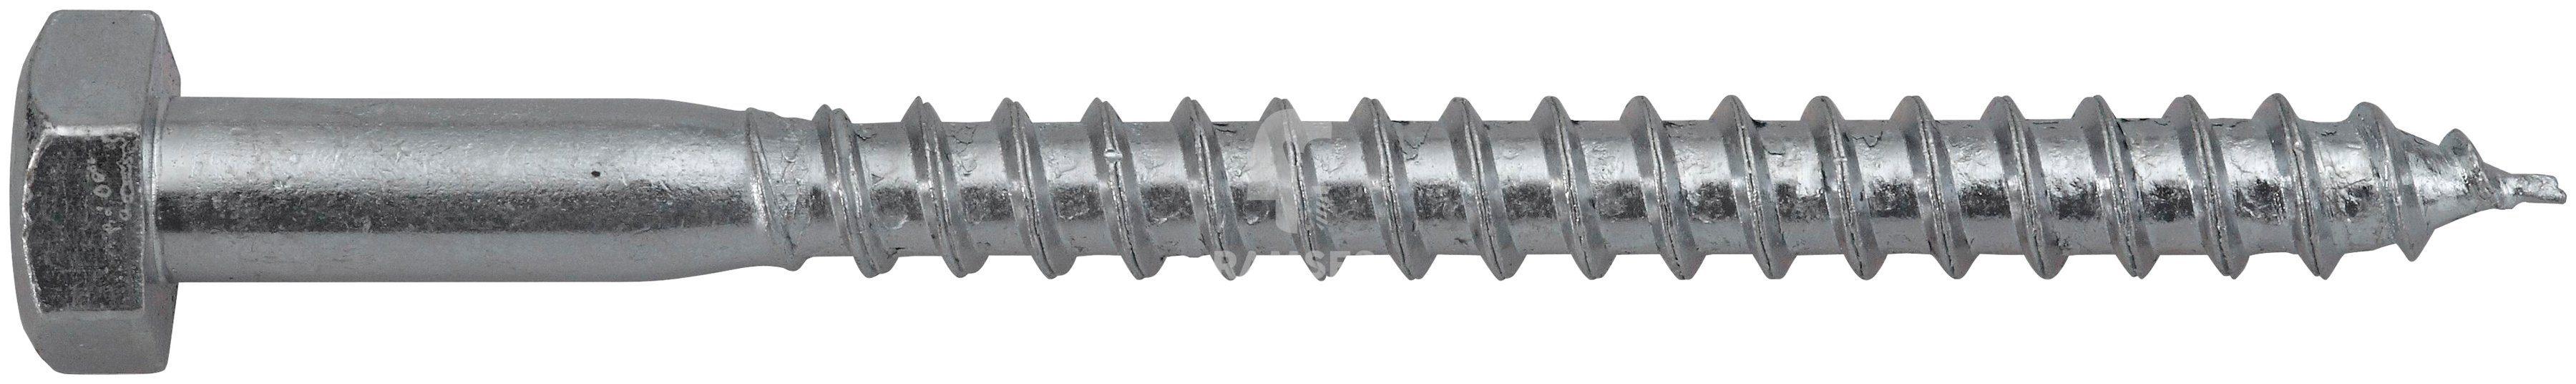 RAMSES Schrauben , Sechskant-Holzschraube 10 x 180 mm 12 Stk.